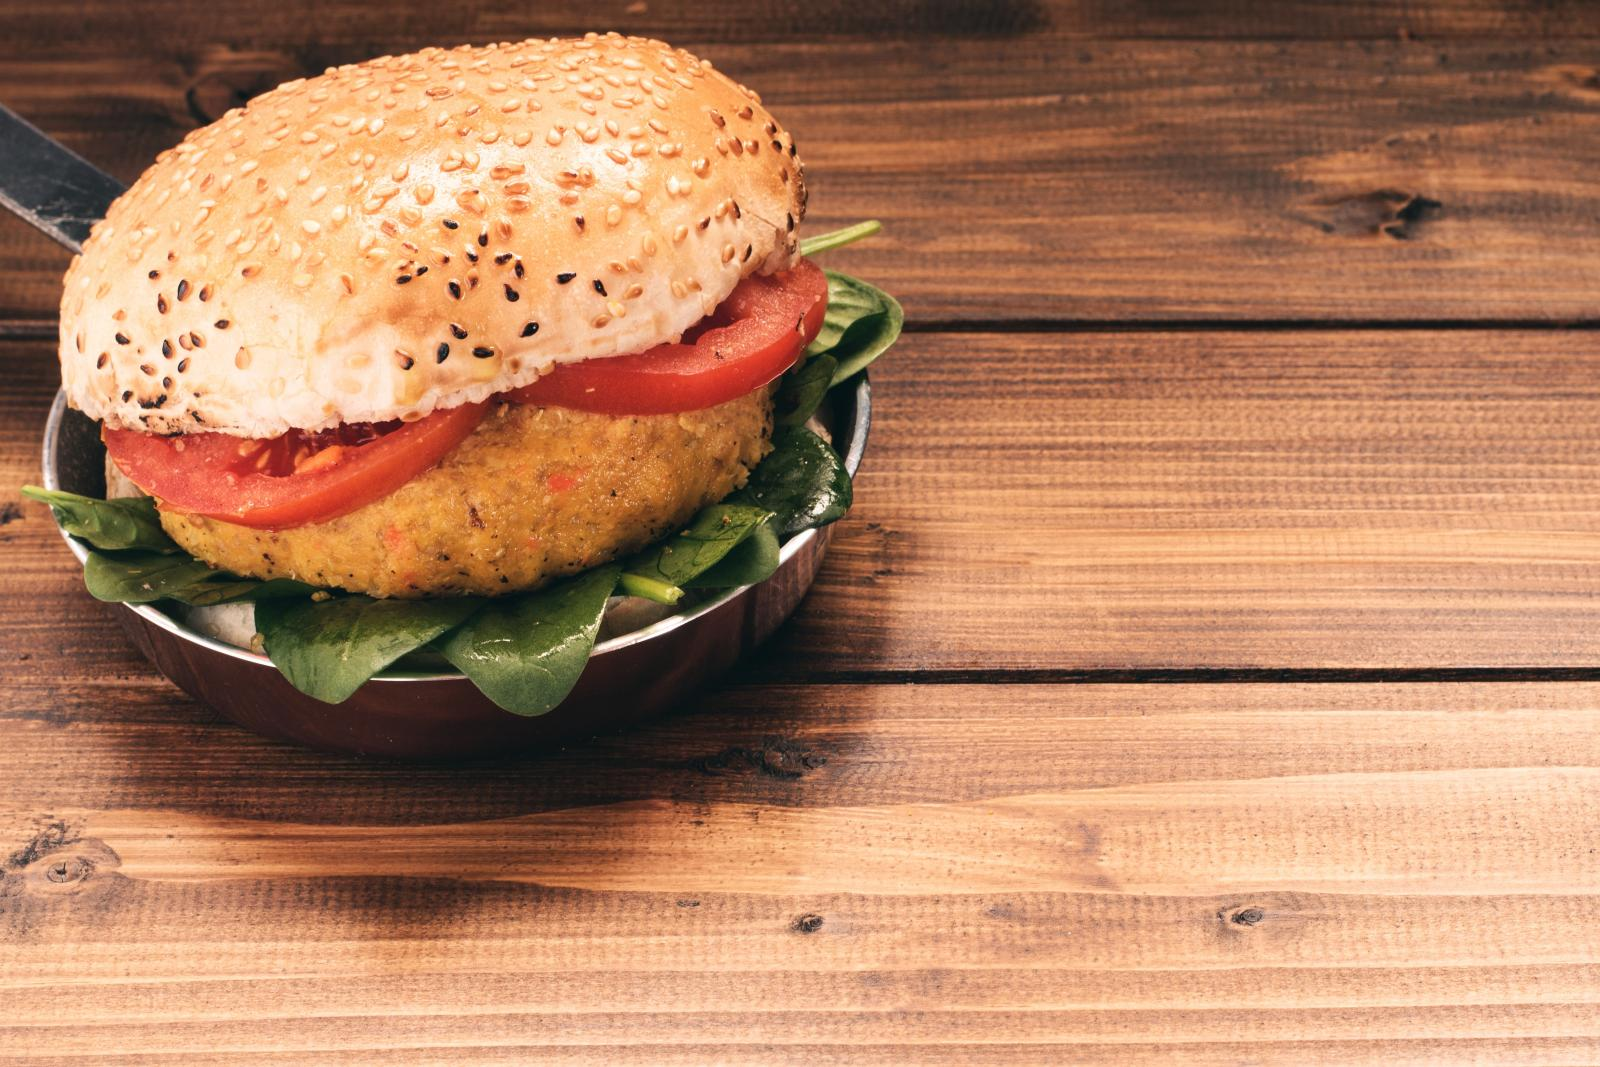 A vegetable burger. Photo credit: Pexels